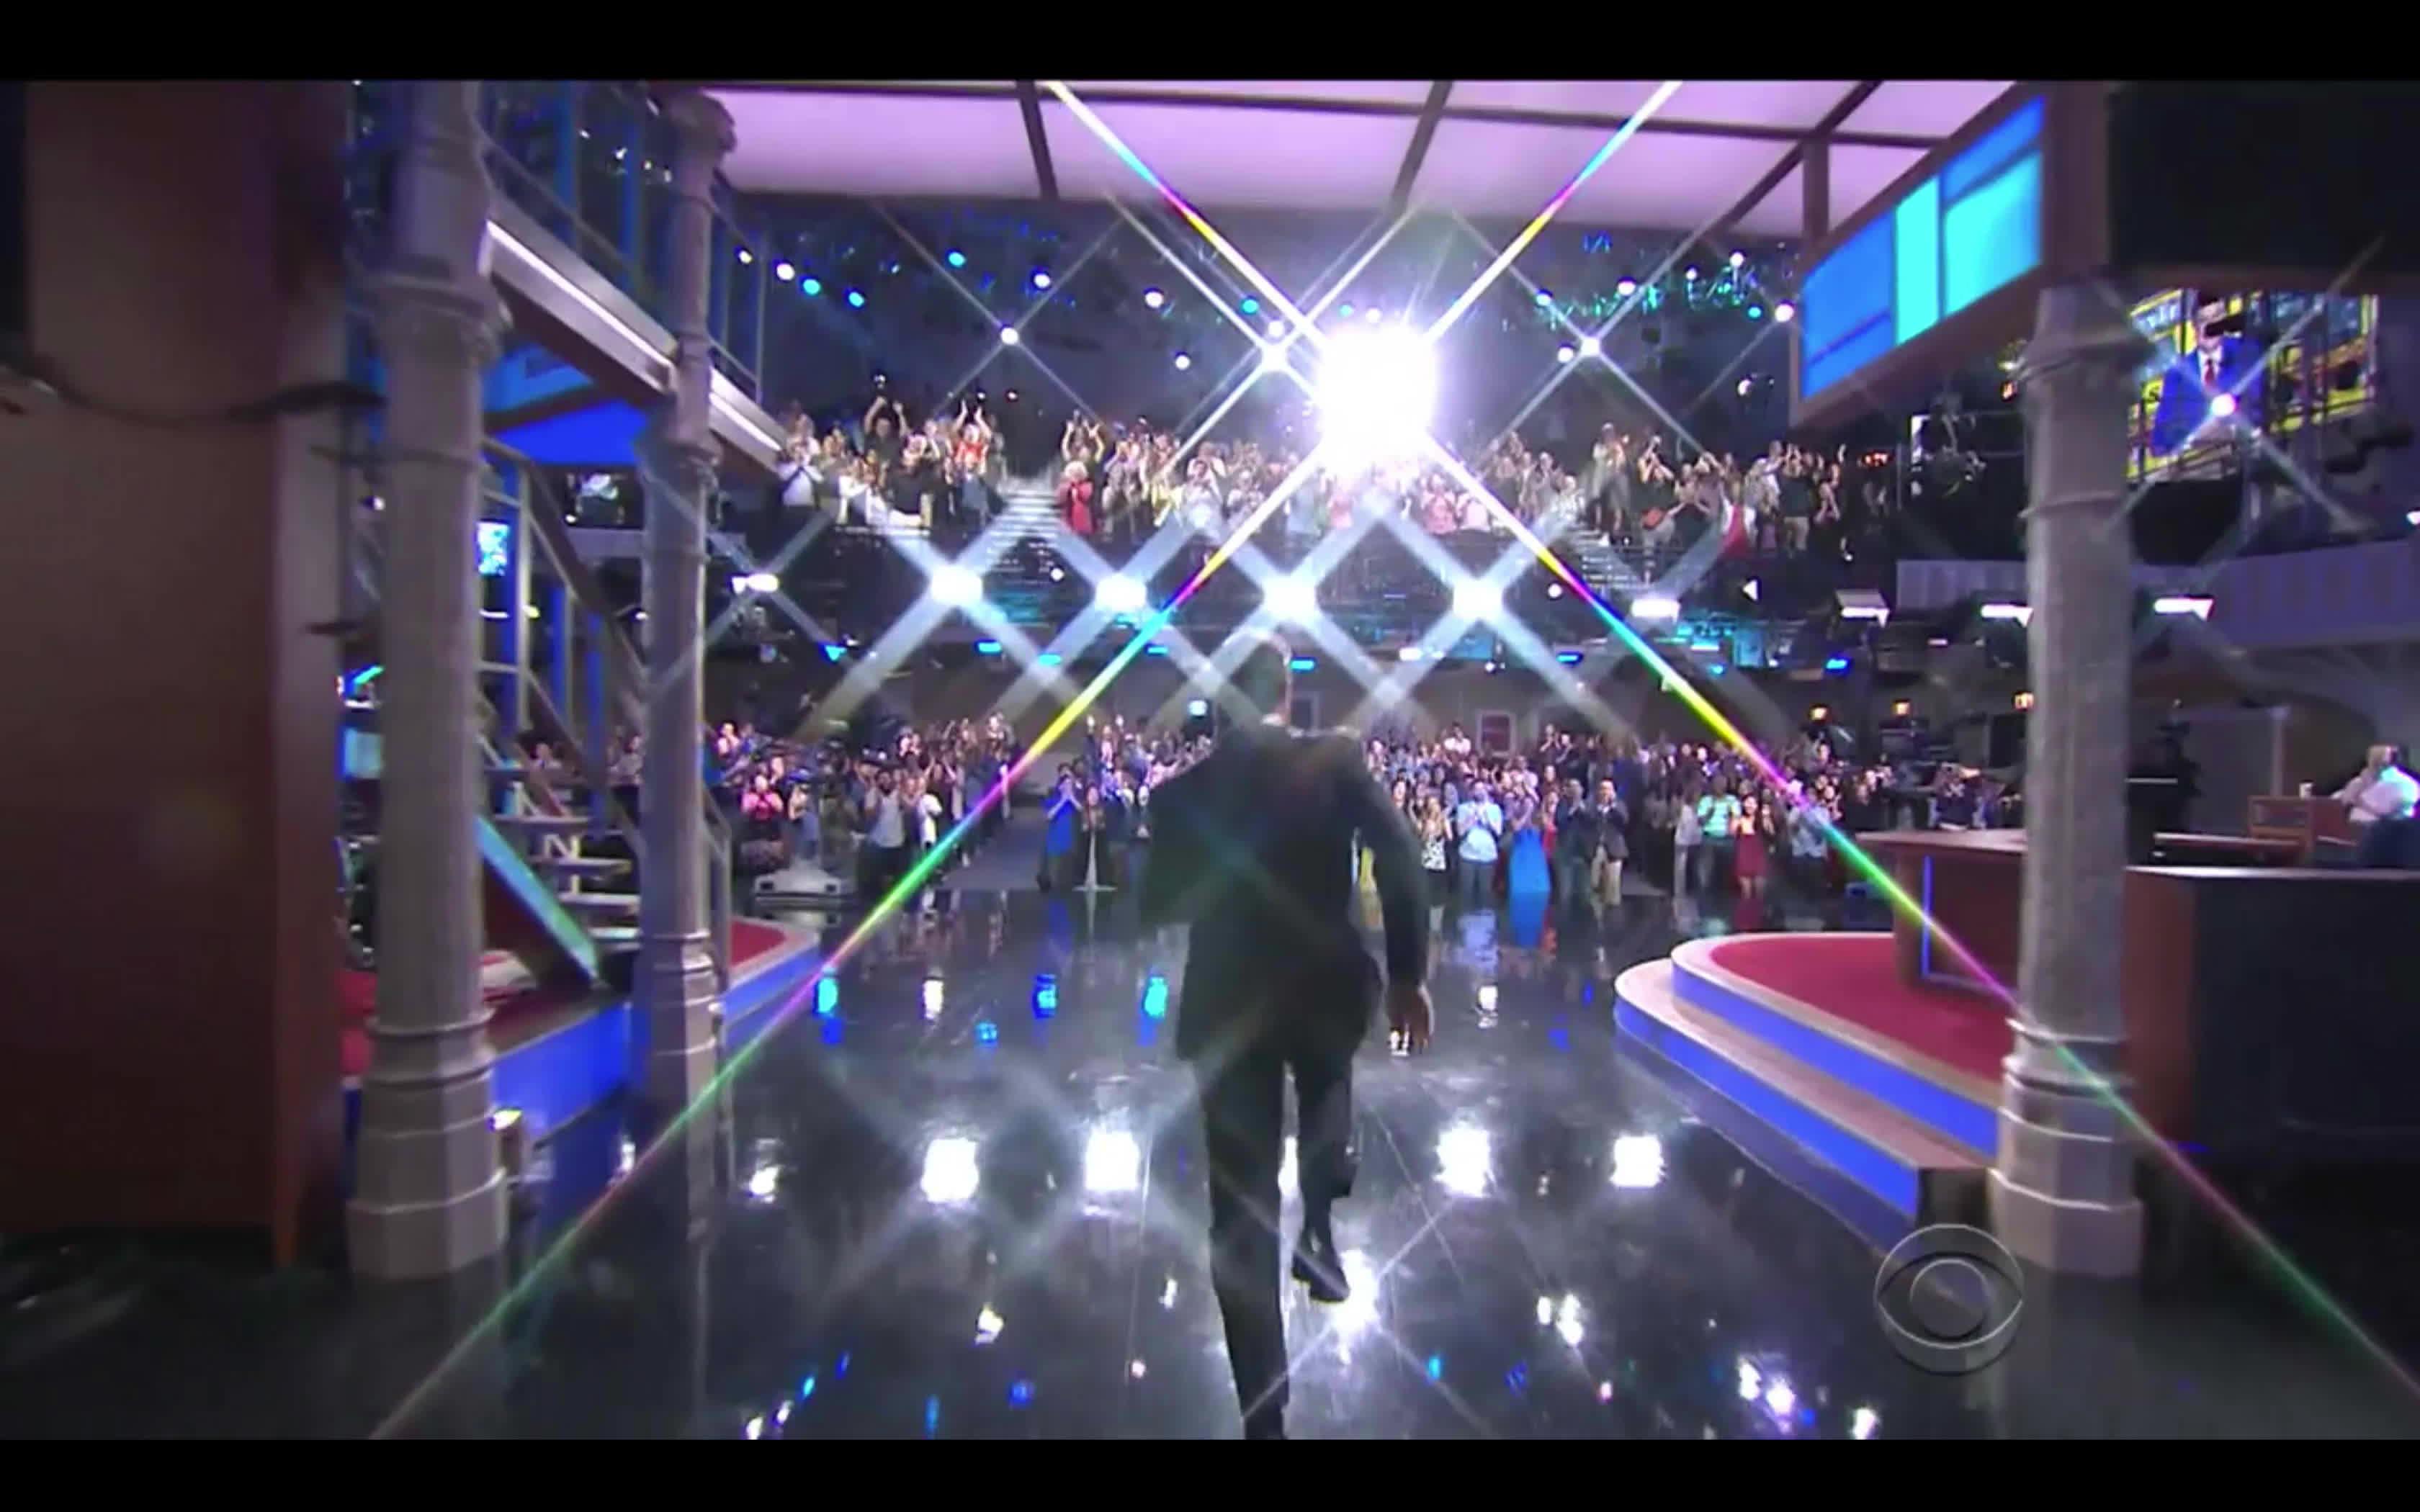 Colbert GIFs